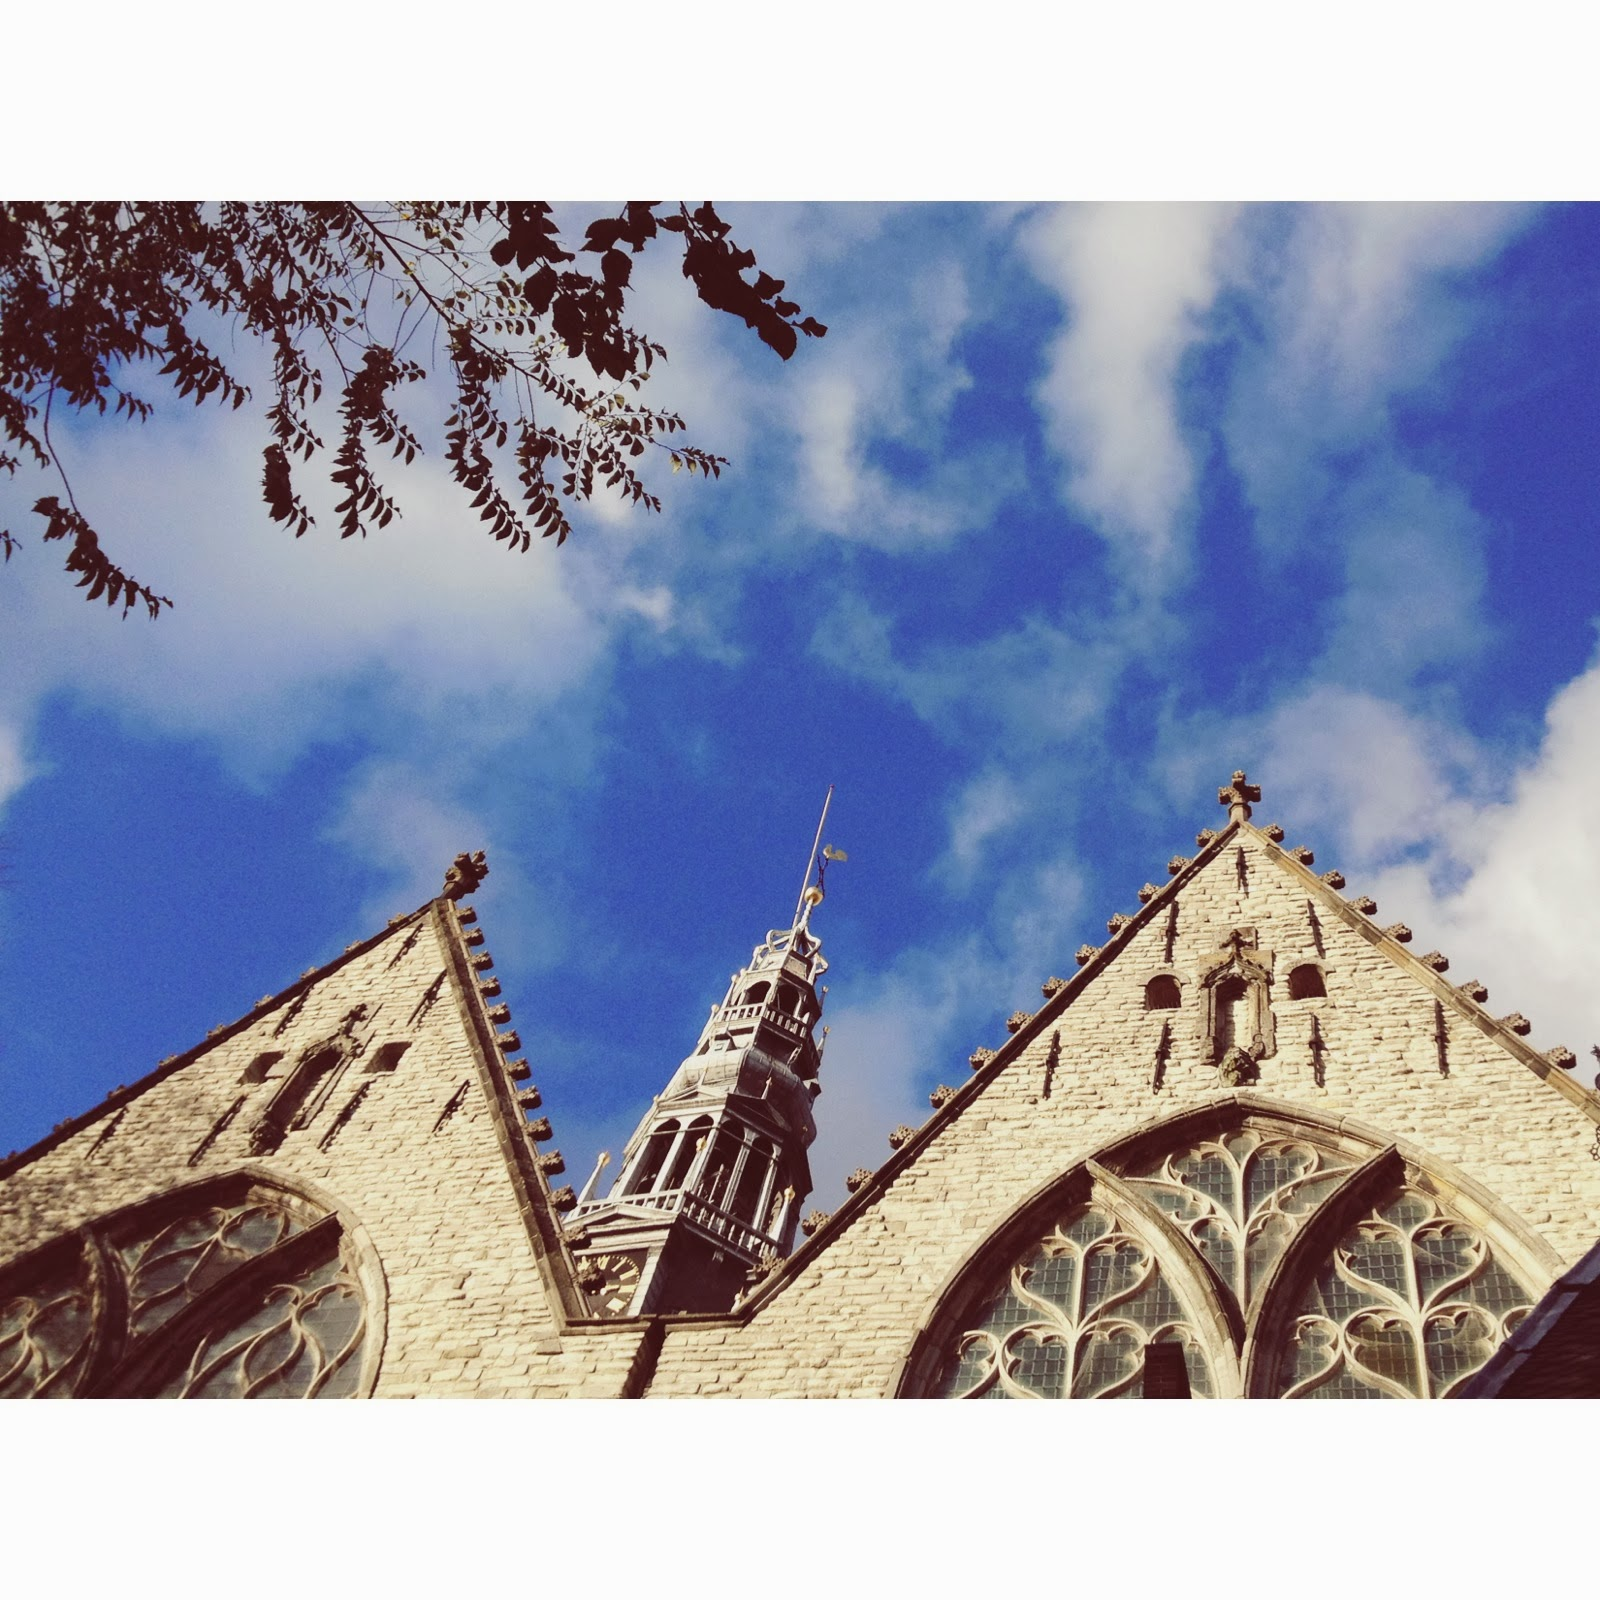 Oude-Kerk-la-iglesia-mas-antigua-de-Amsterdam